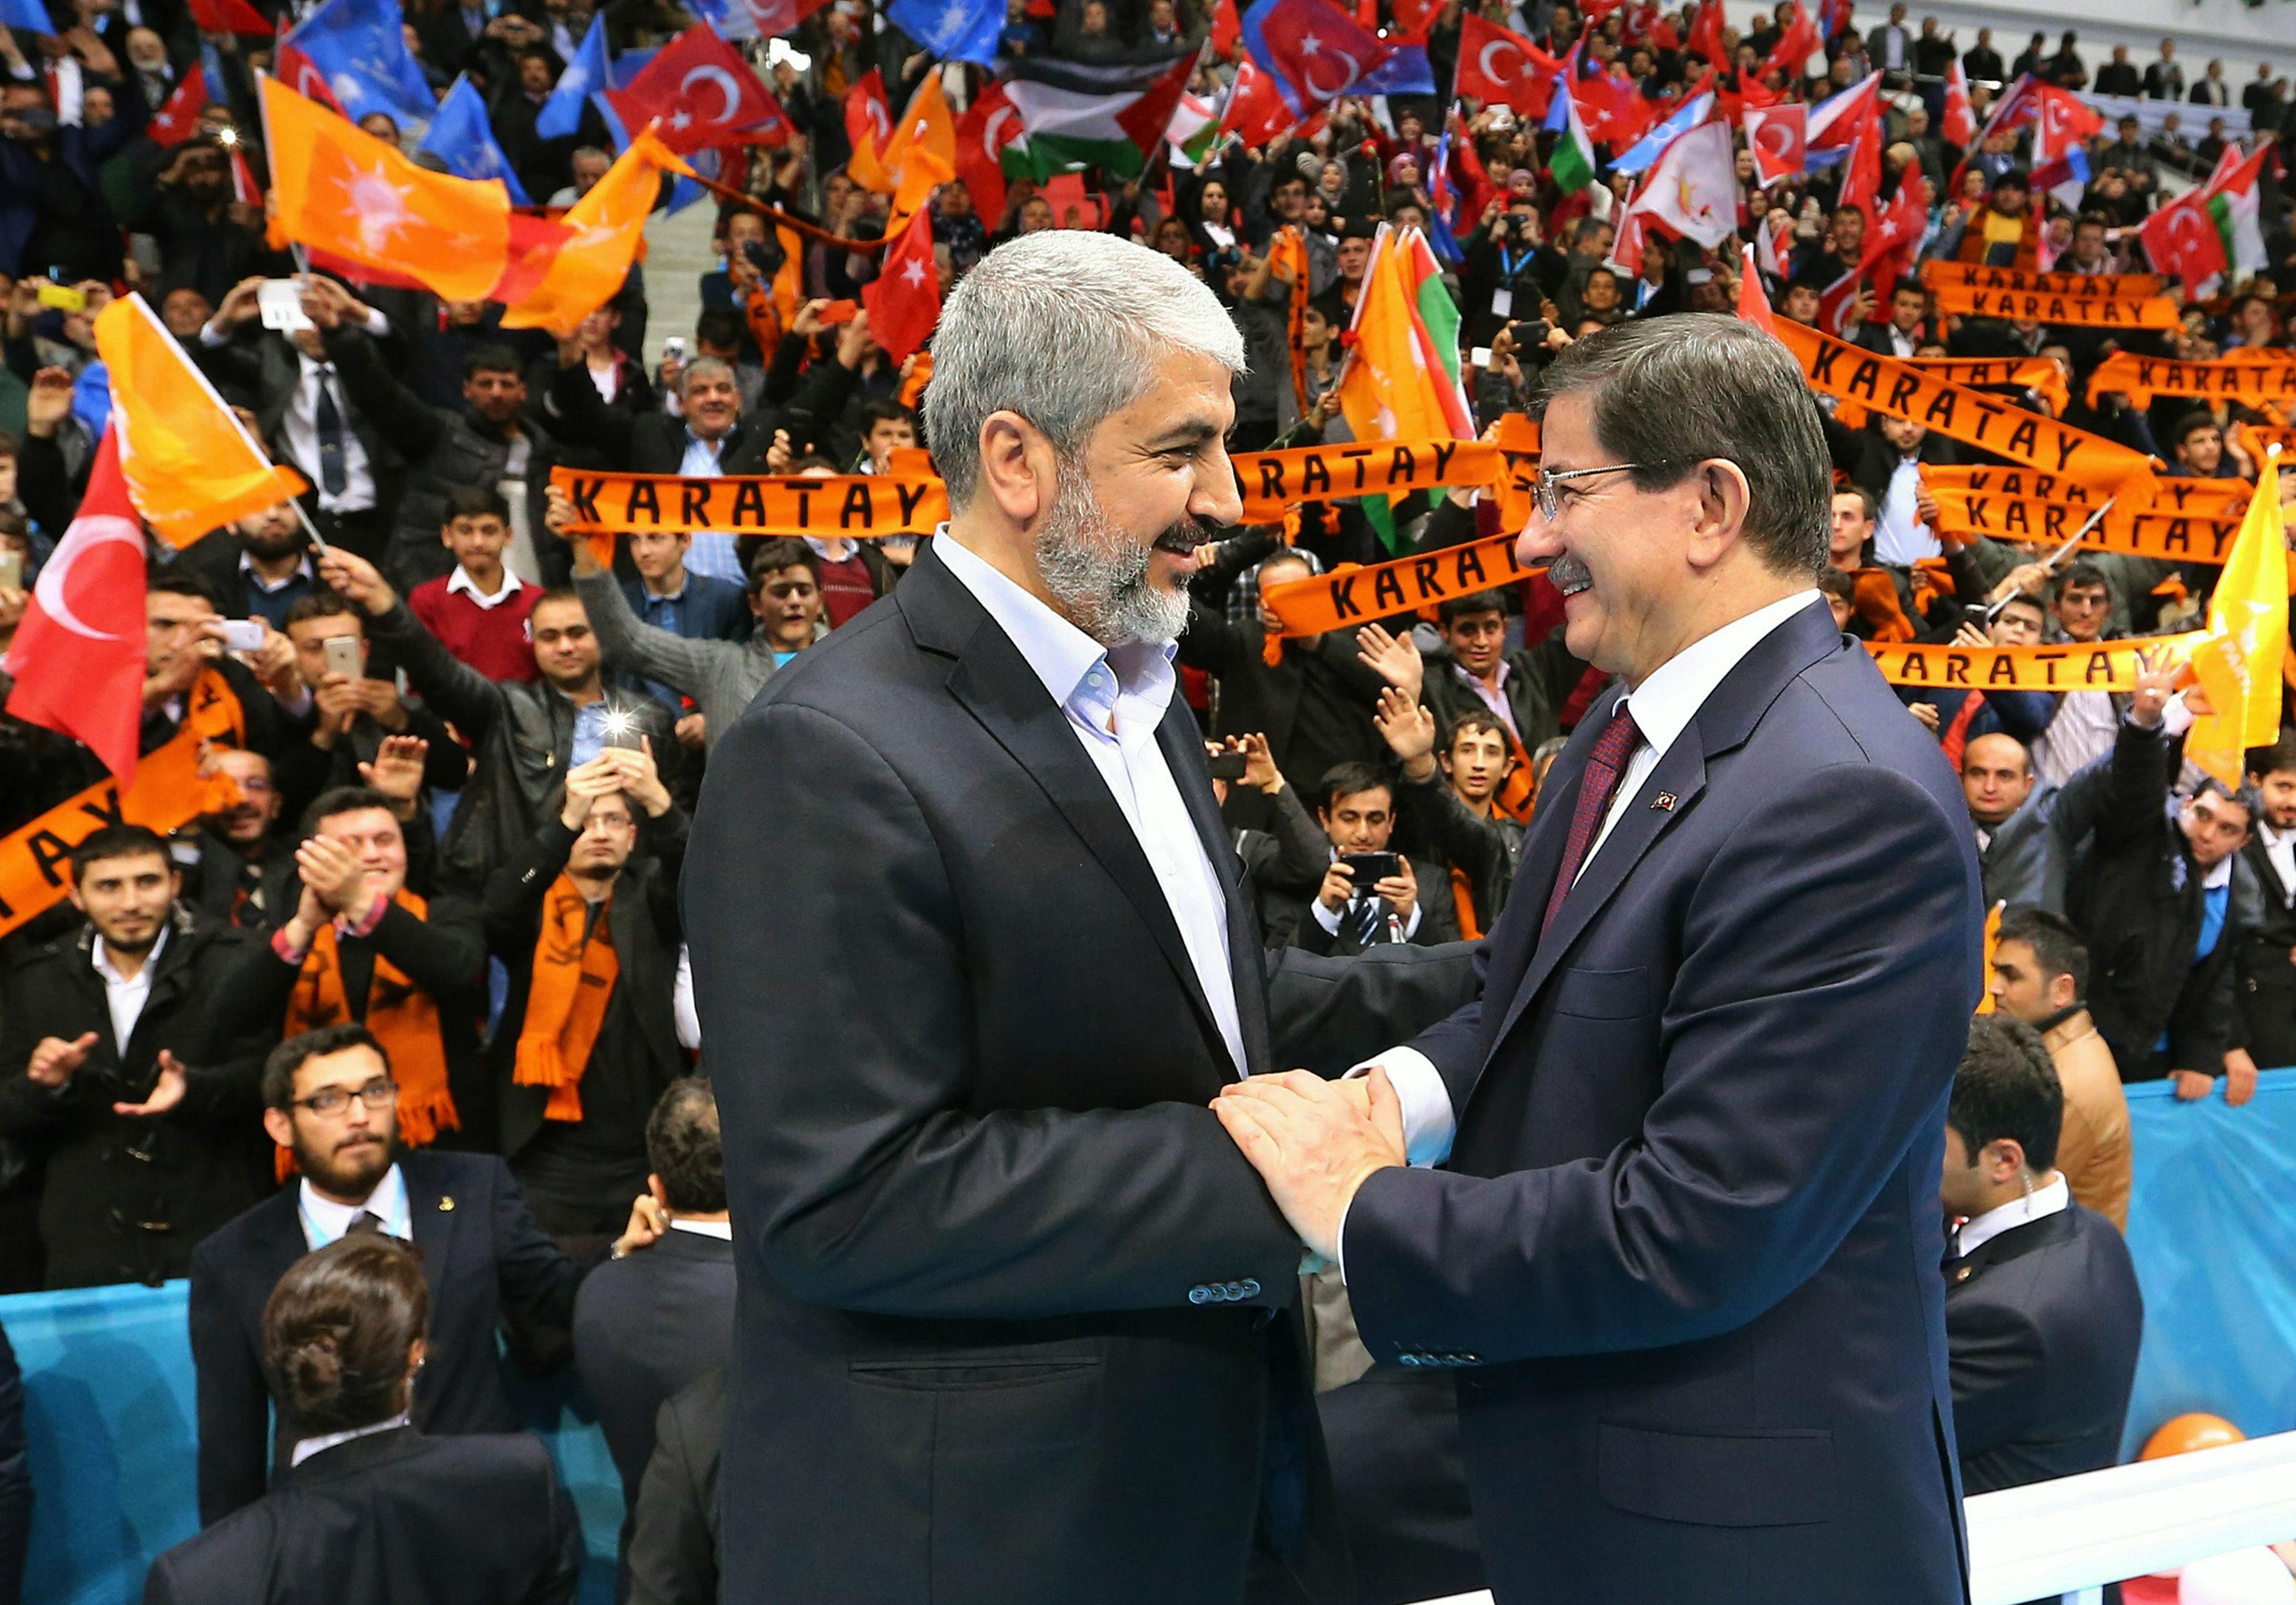 Hamas new base in turkey turkish prime minister ahmet davutolu r and hamas leader khaled mashaal greet each other m4hsunfo